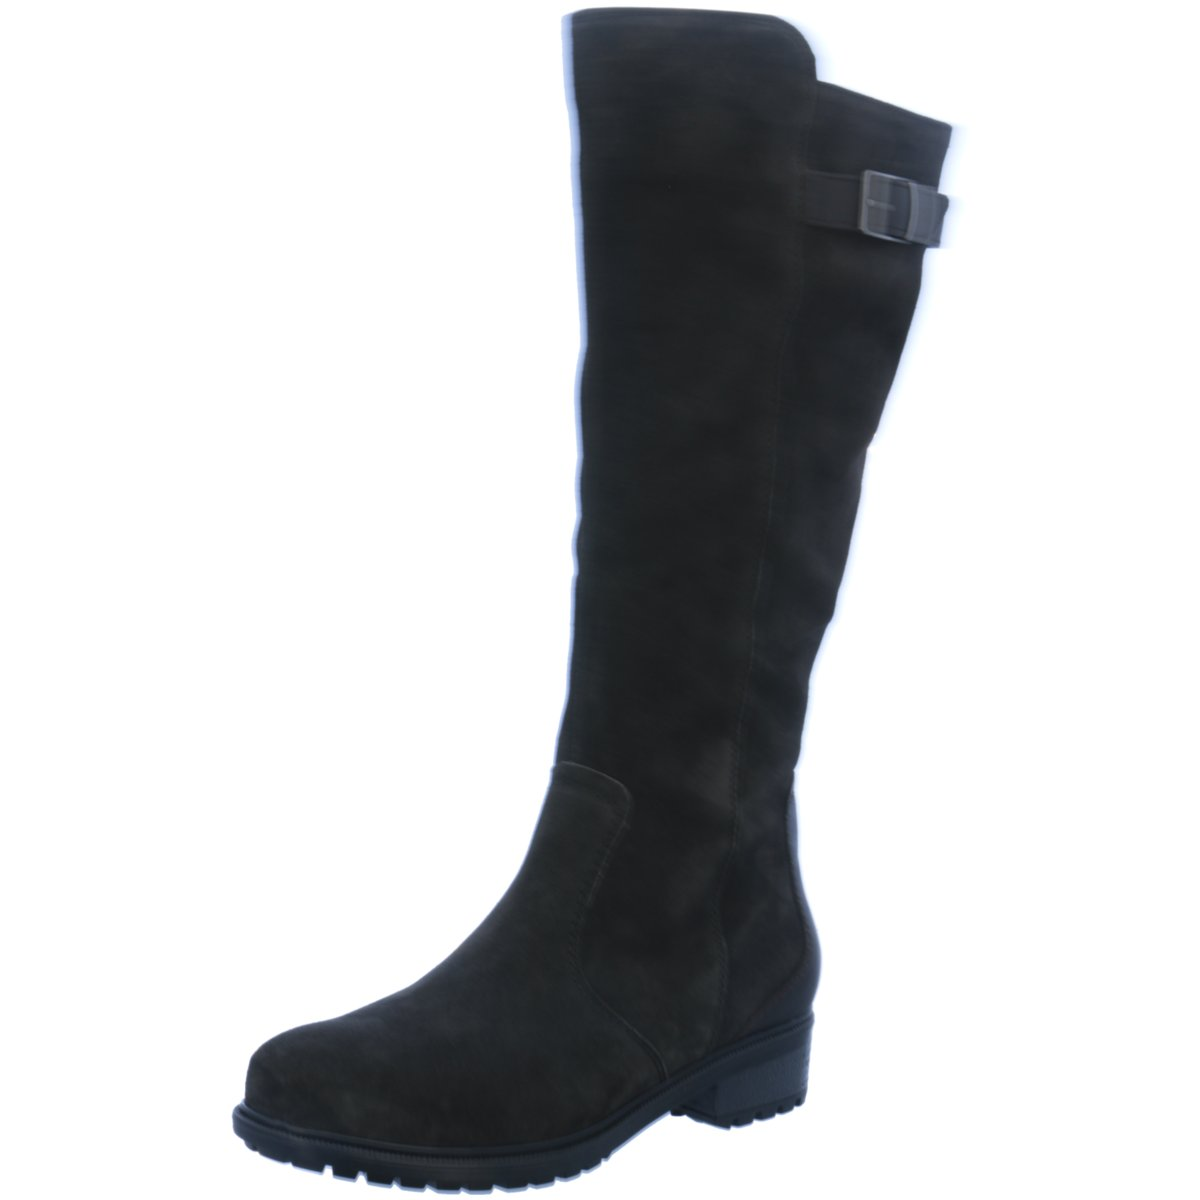 NEU ara Damen Stiefel Schaftweite XL 12-48818-68 grau 363378